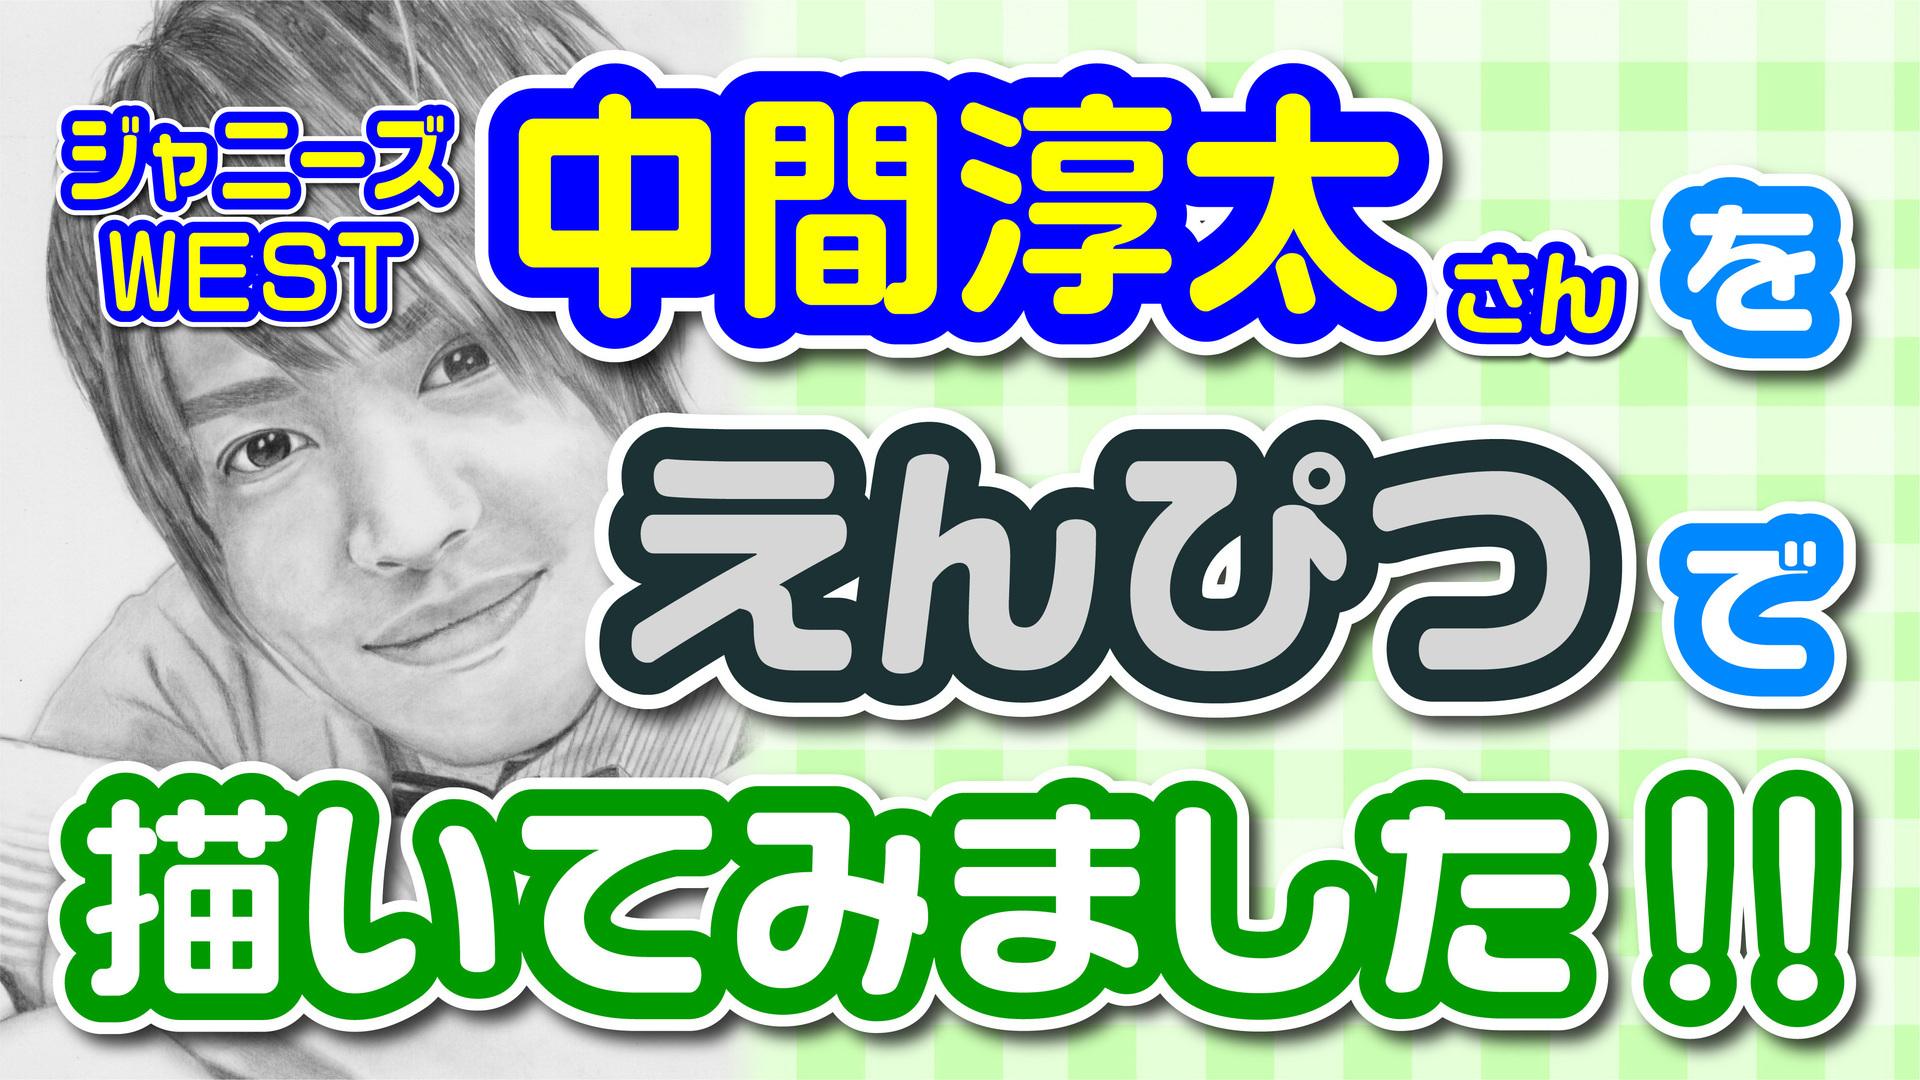 Youtubeサムネイル 中間淳太鉛筆画.jpg